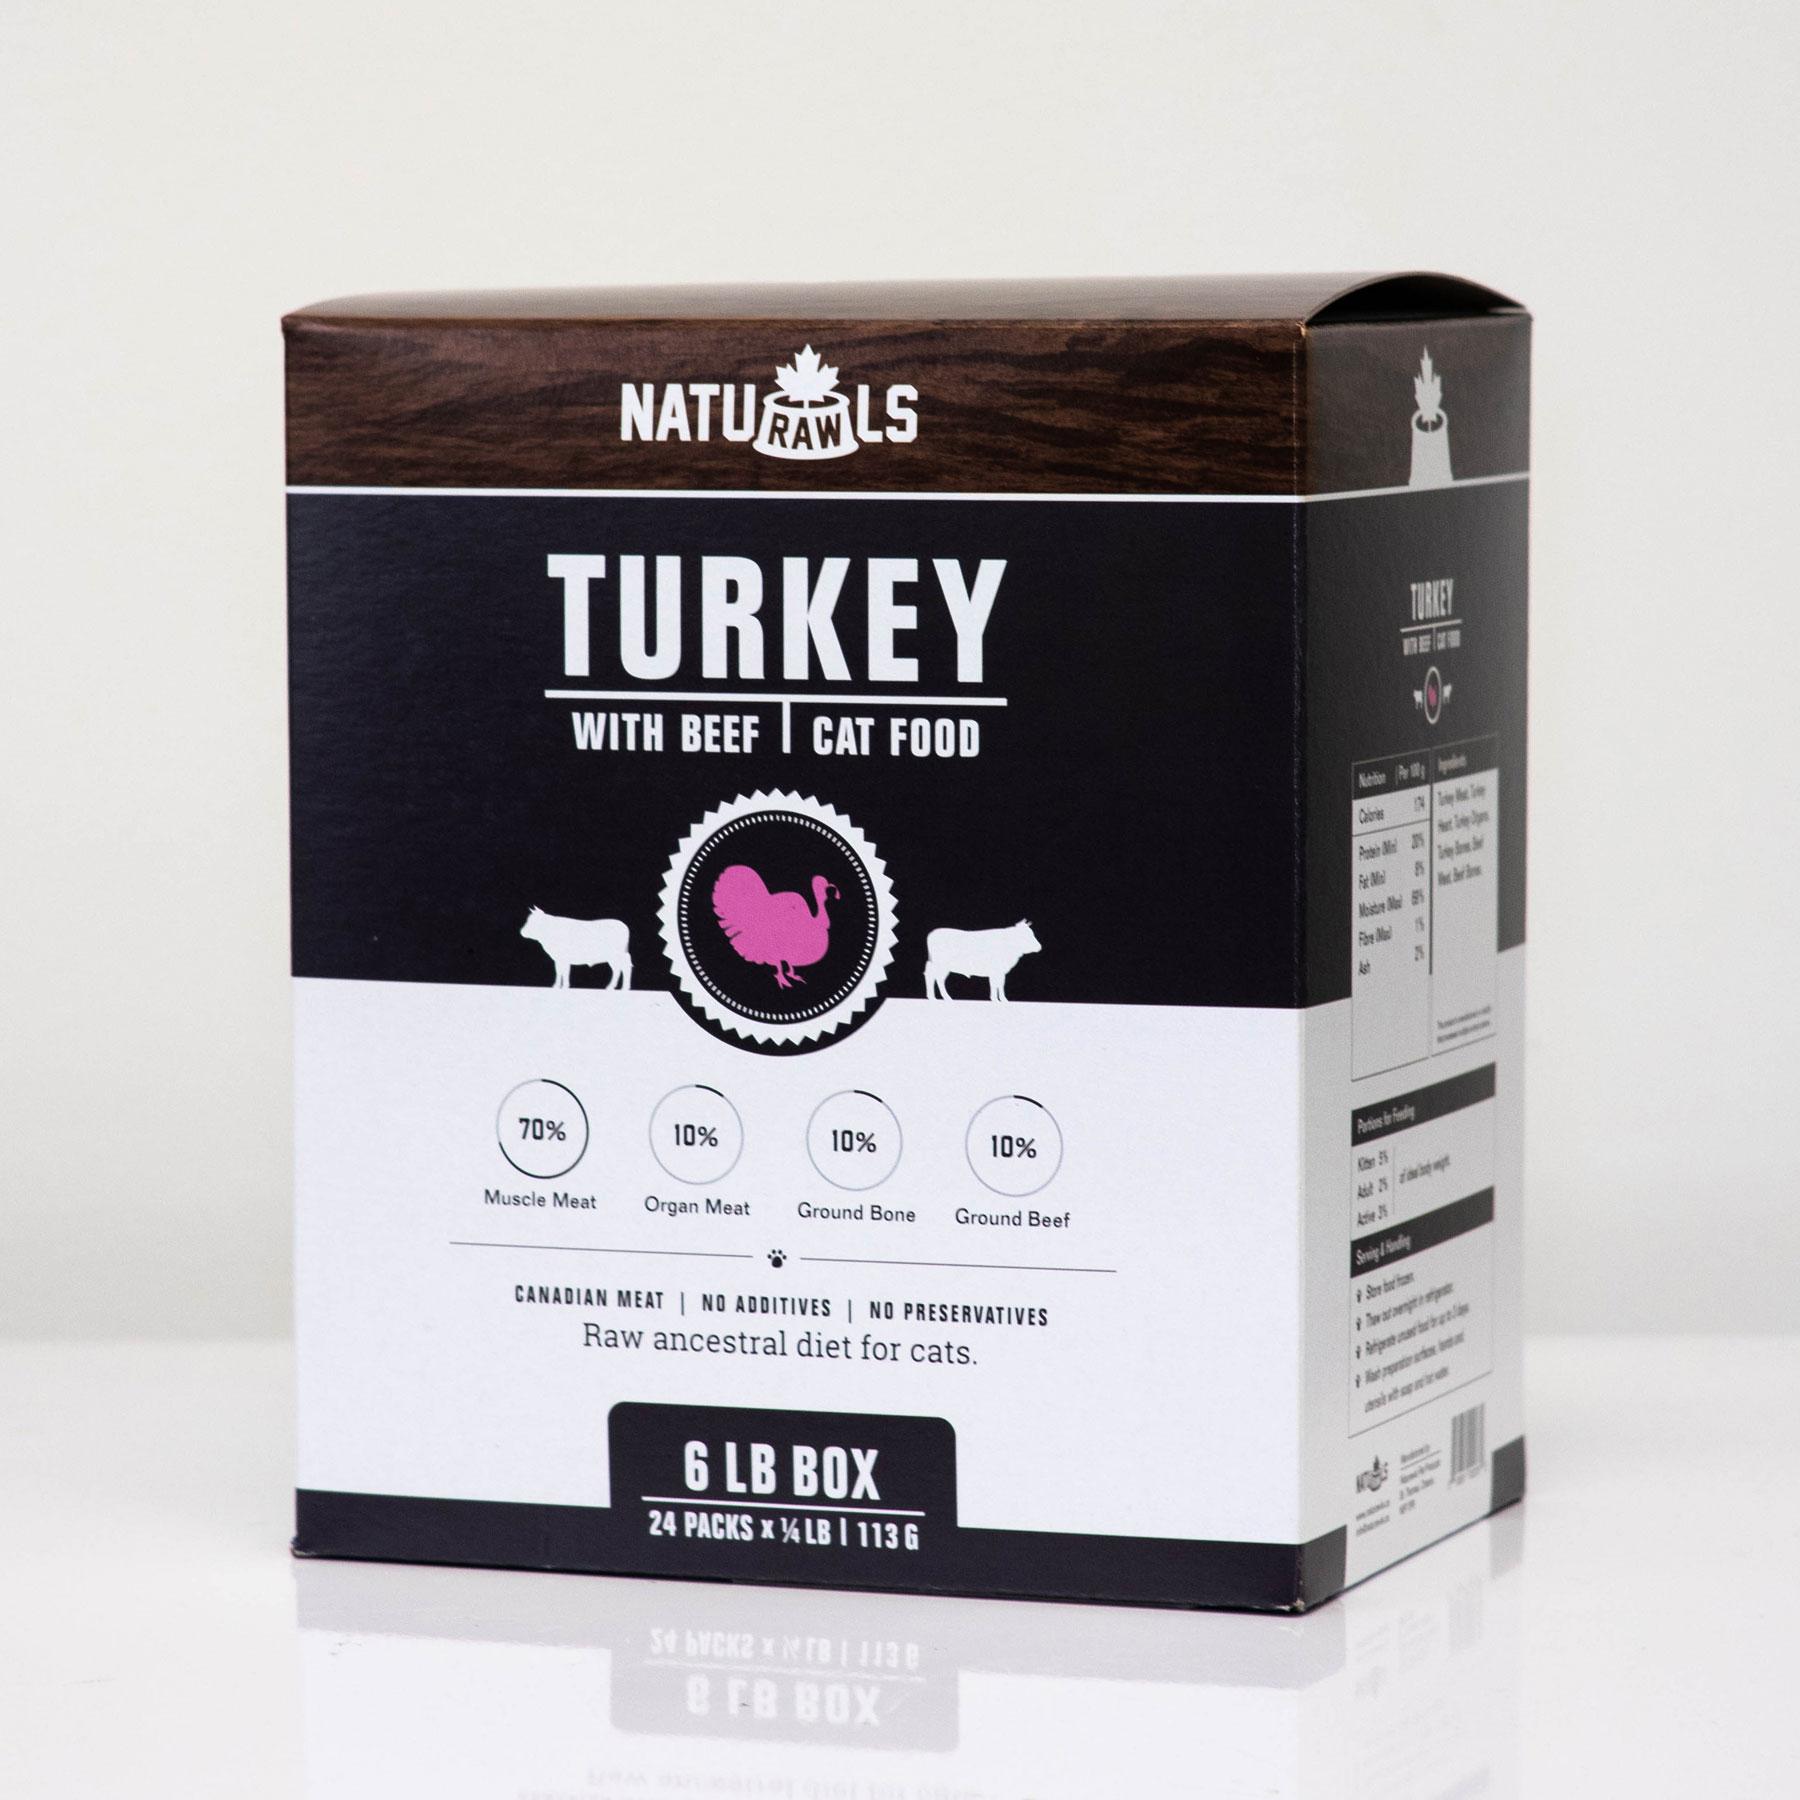 Naturawls Turkey with Beef Raw Cat Food, 6-lb